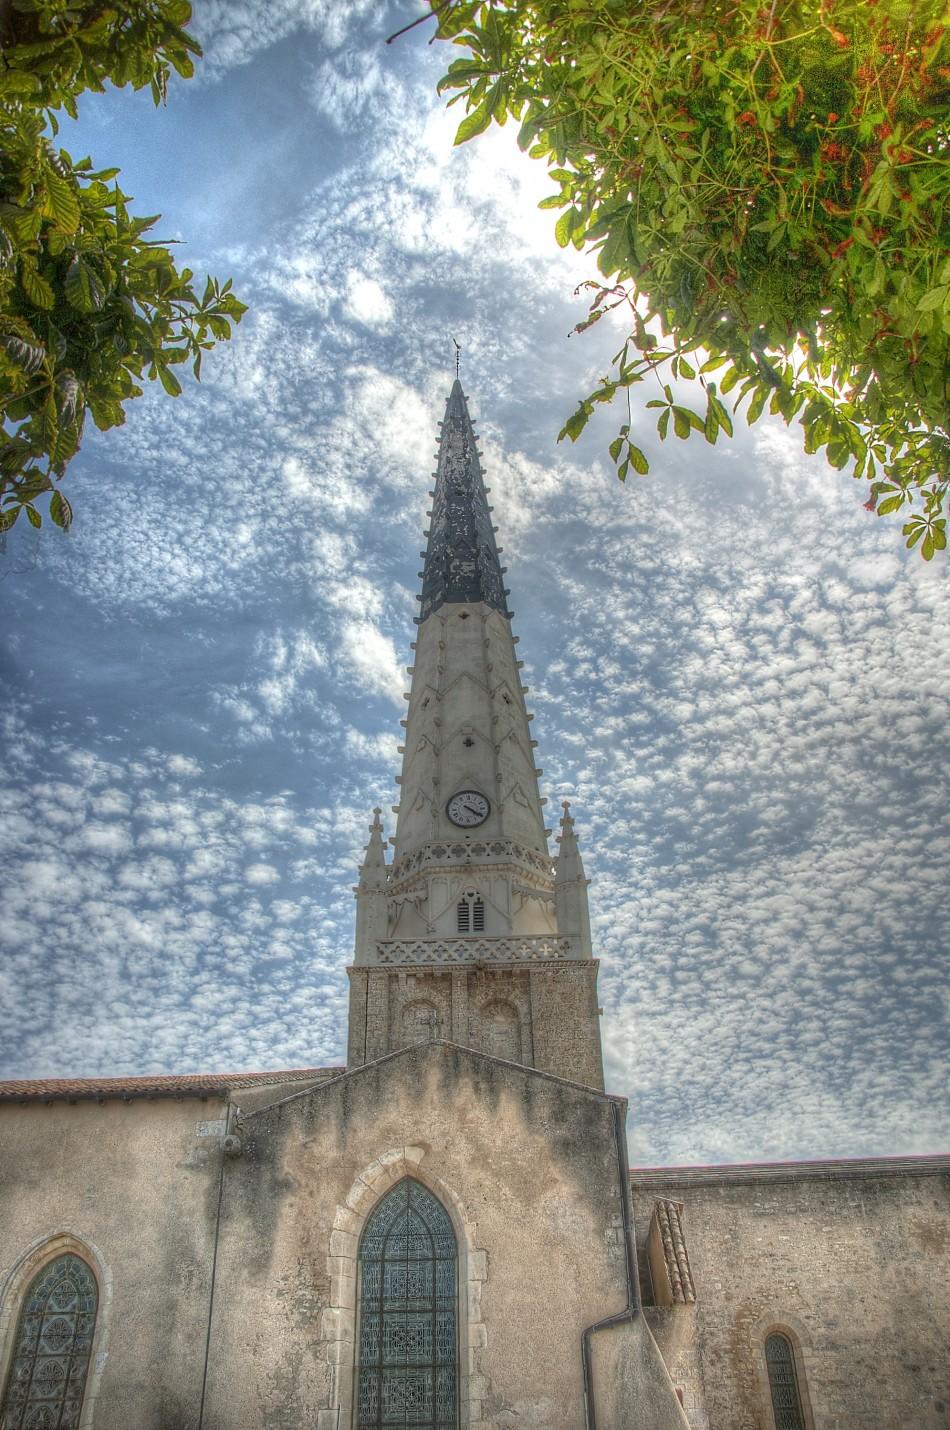 Ars-En-Re Church Steeple